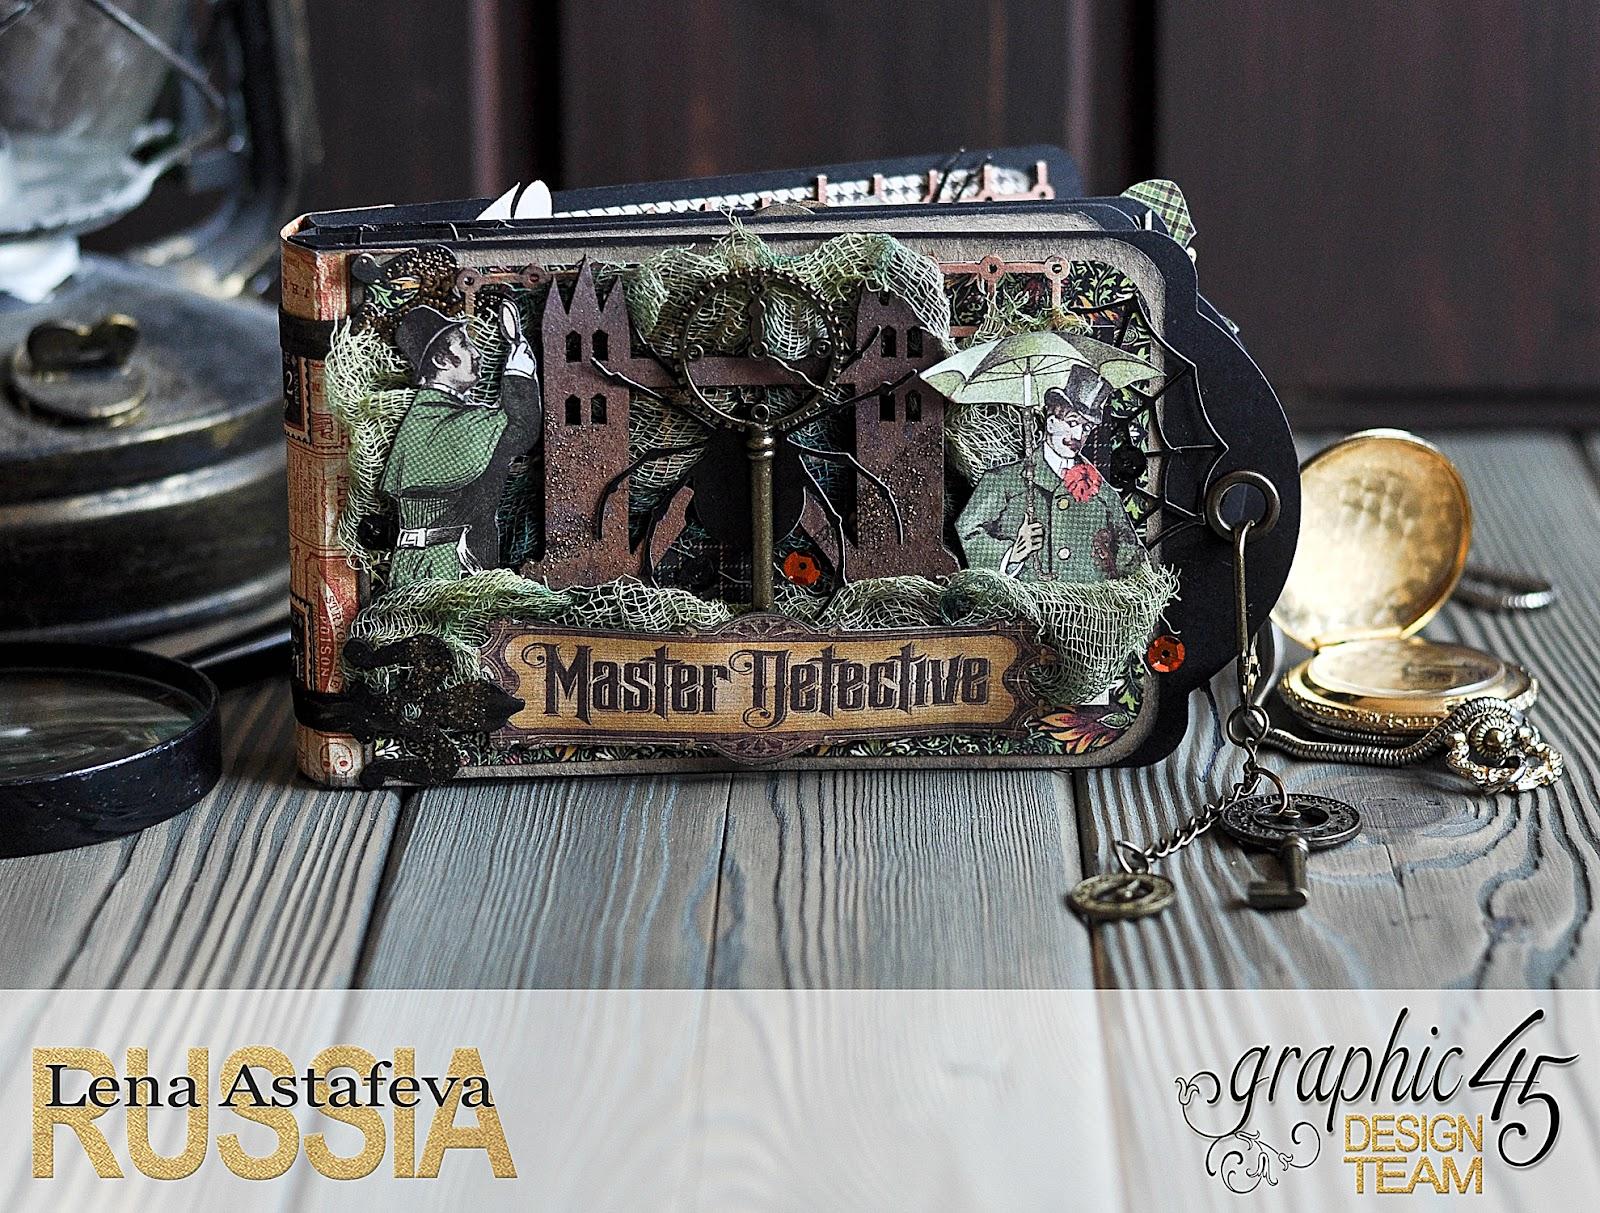 Album-Master Detective-product byGraphic 45- by Lena Astafeva-1.jpg